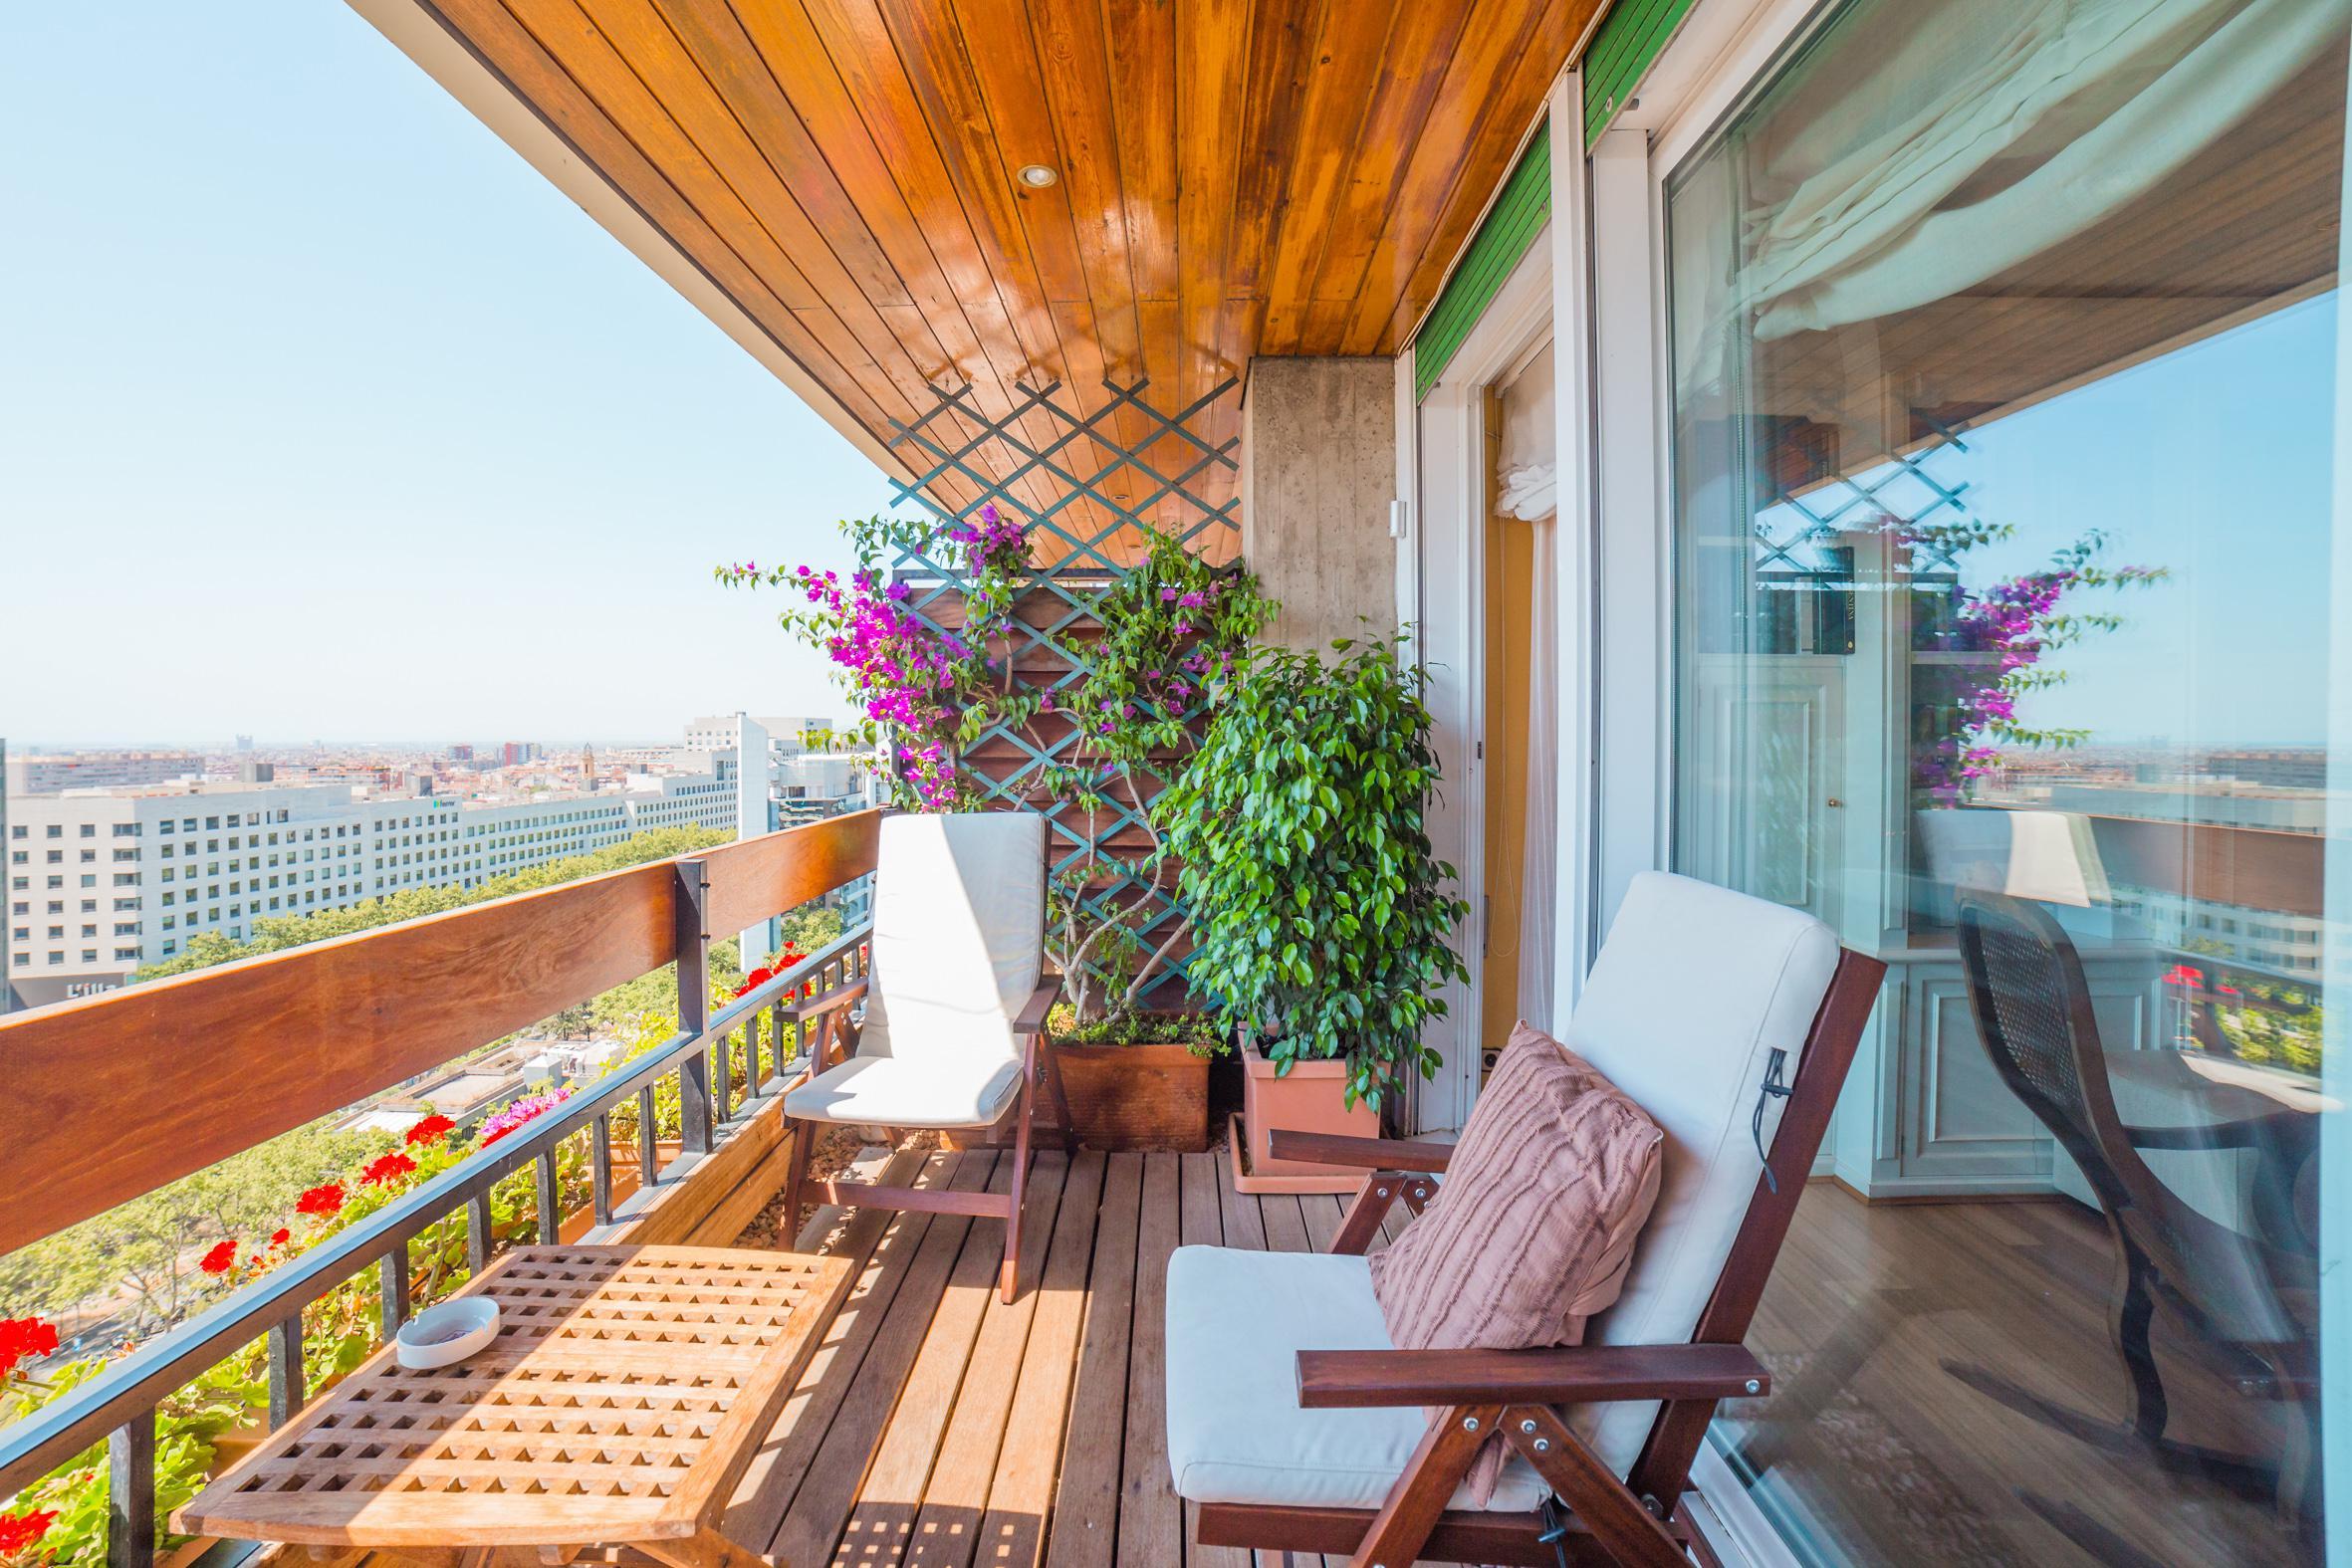 253515 Apartamento en venta en Sarrià-Sant Gervasi, Sant Gervasi-Galvany 1